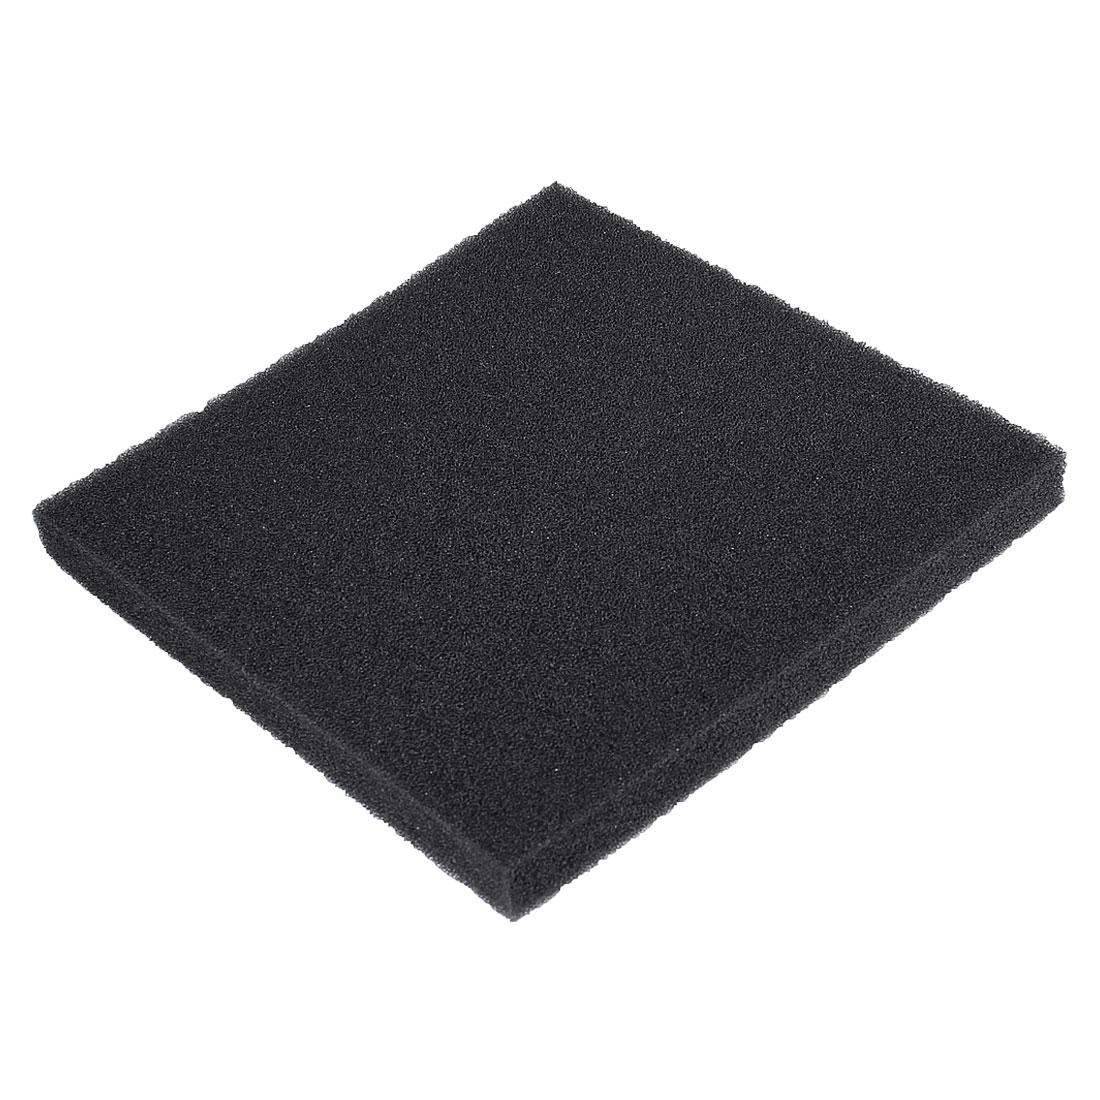 45cmx45cmx4cm Black Filter Biochemical Economical Absorbent Sponge for Aquarium